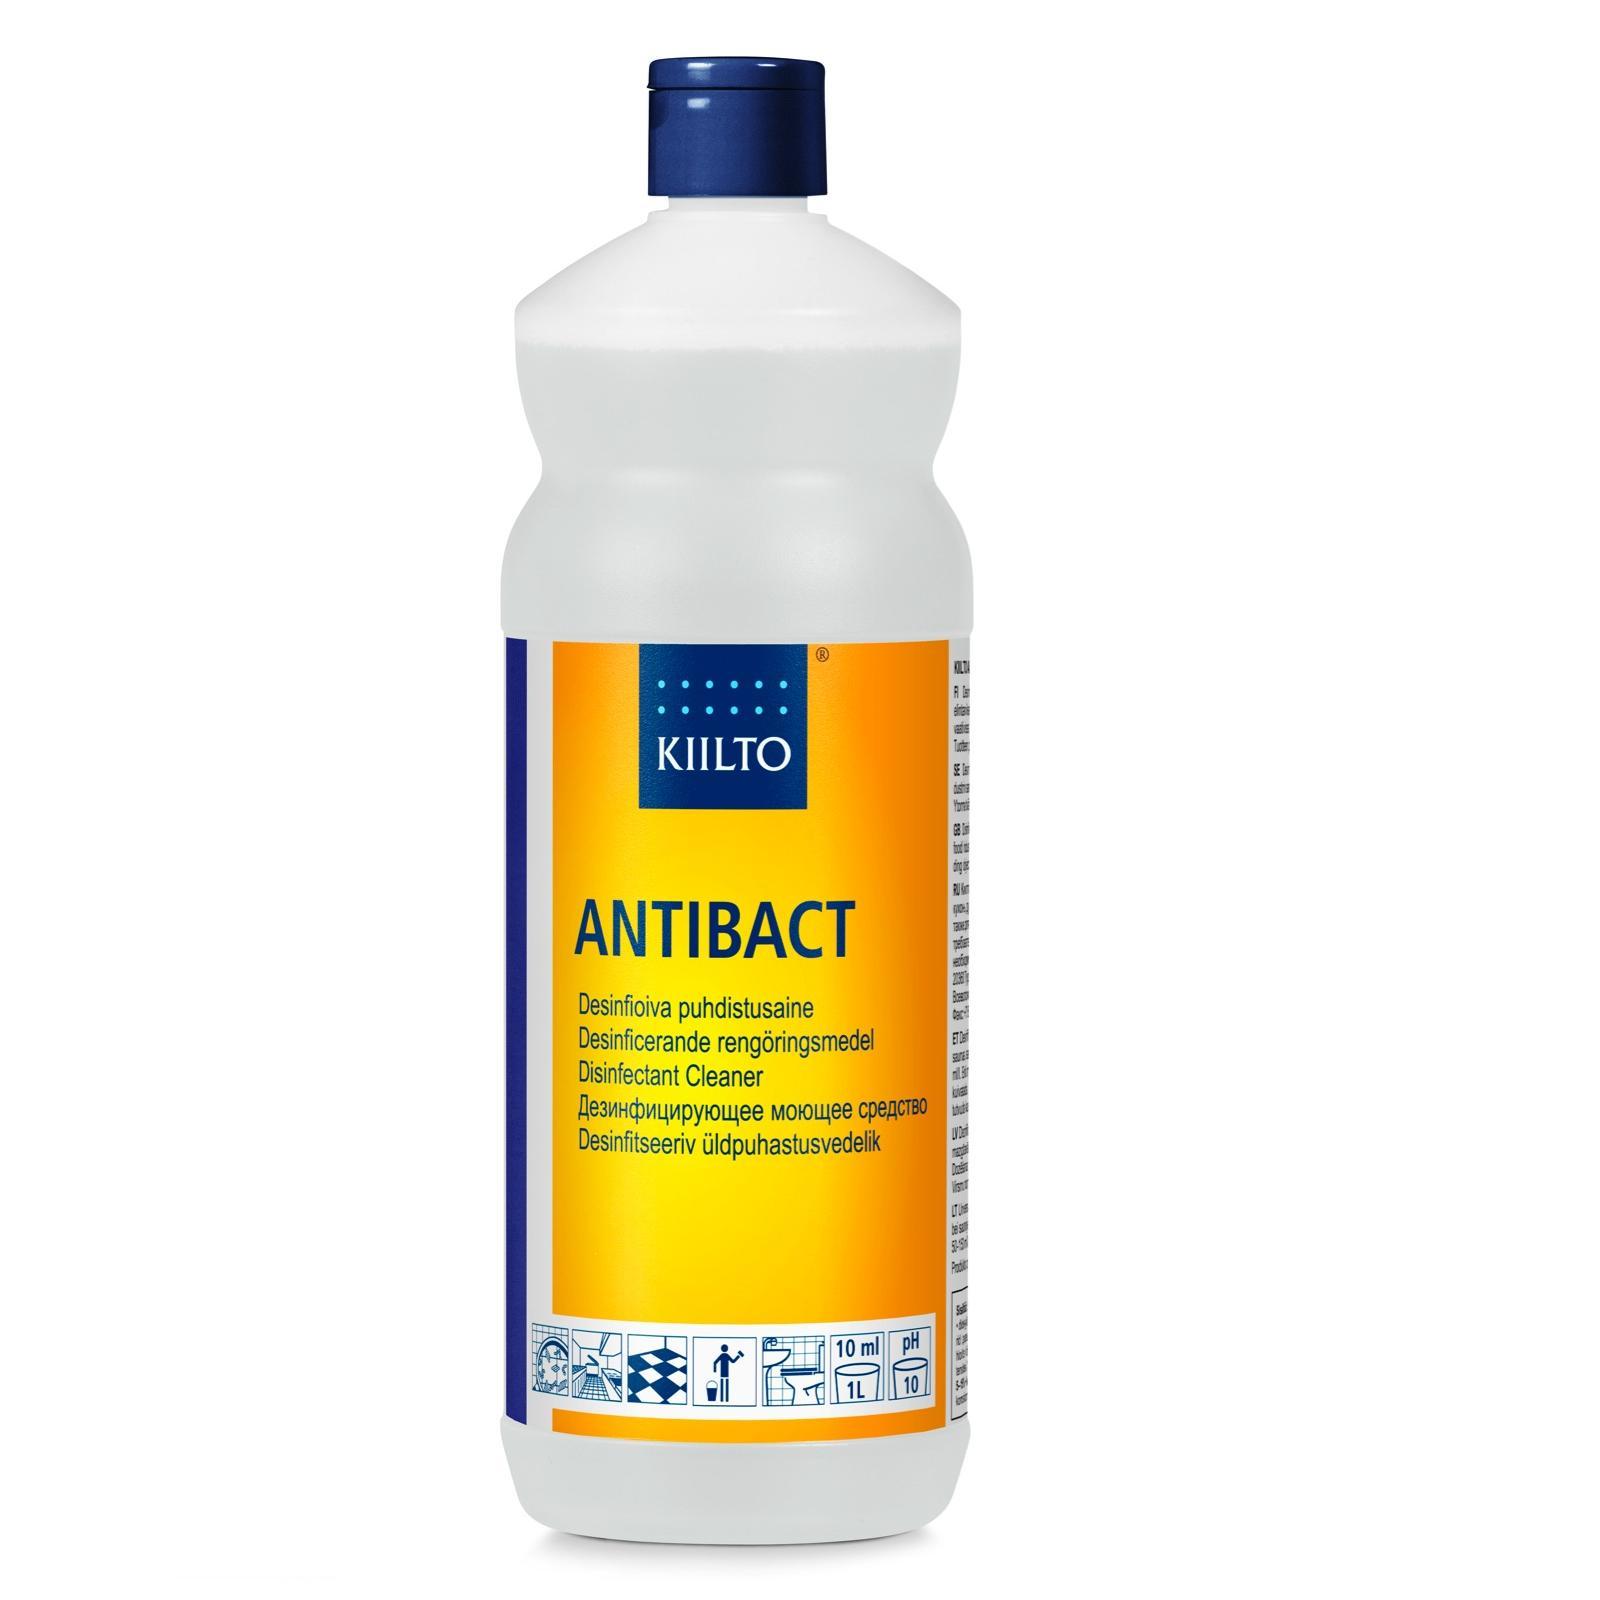 Kiilto Antibact Puhdistusaine 1 l